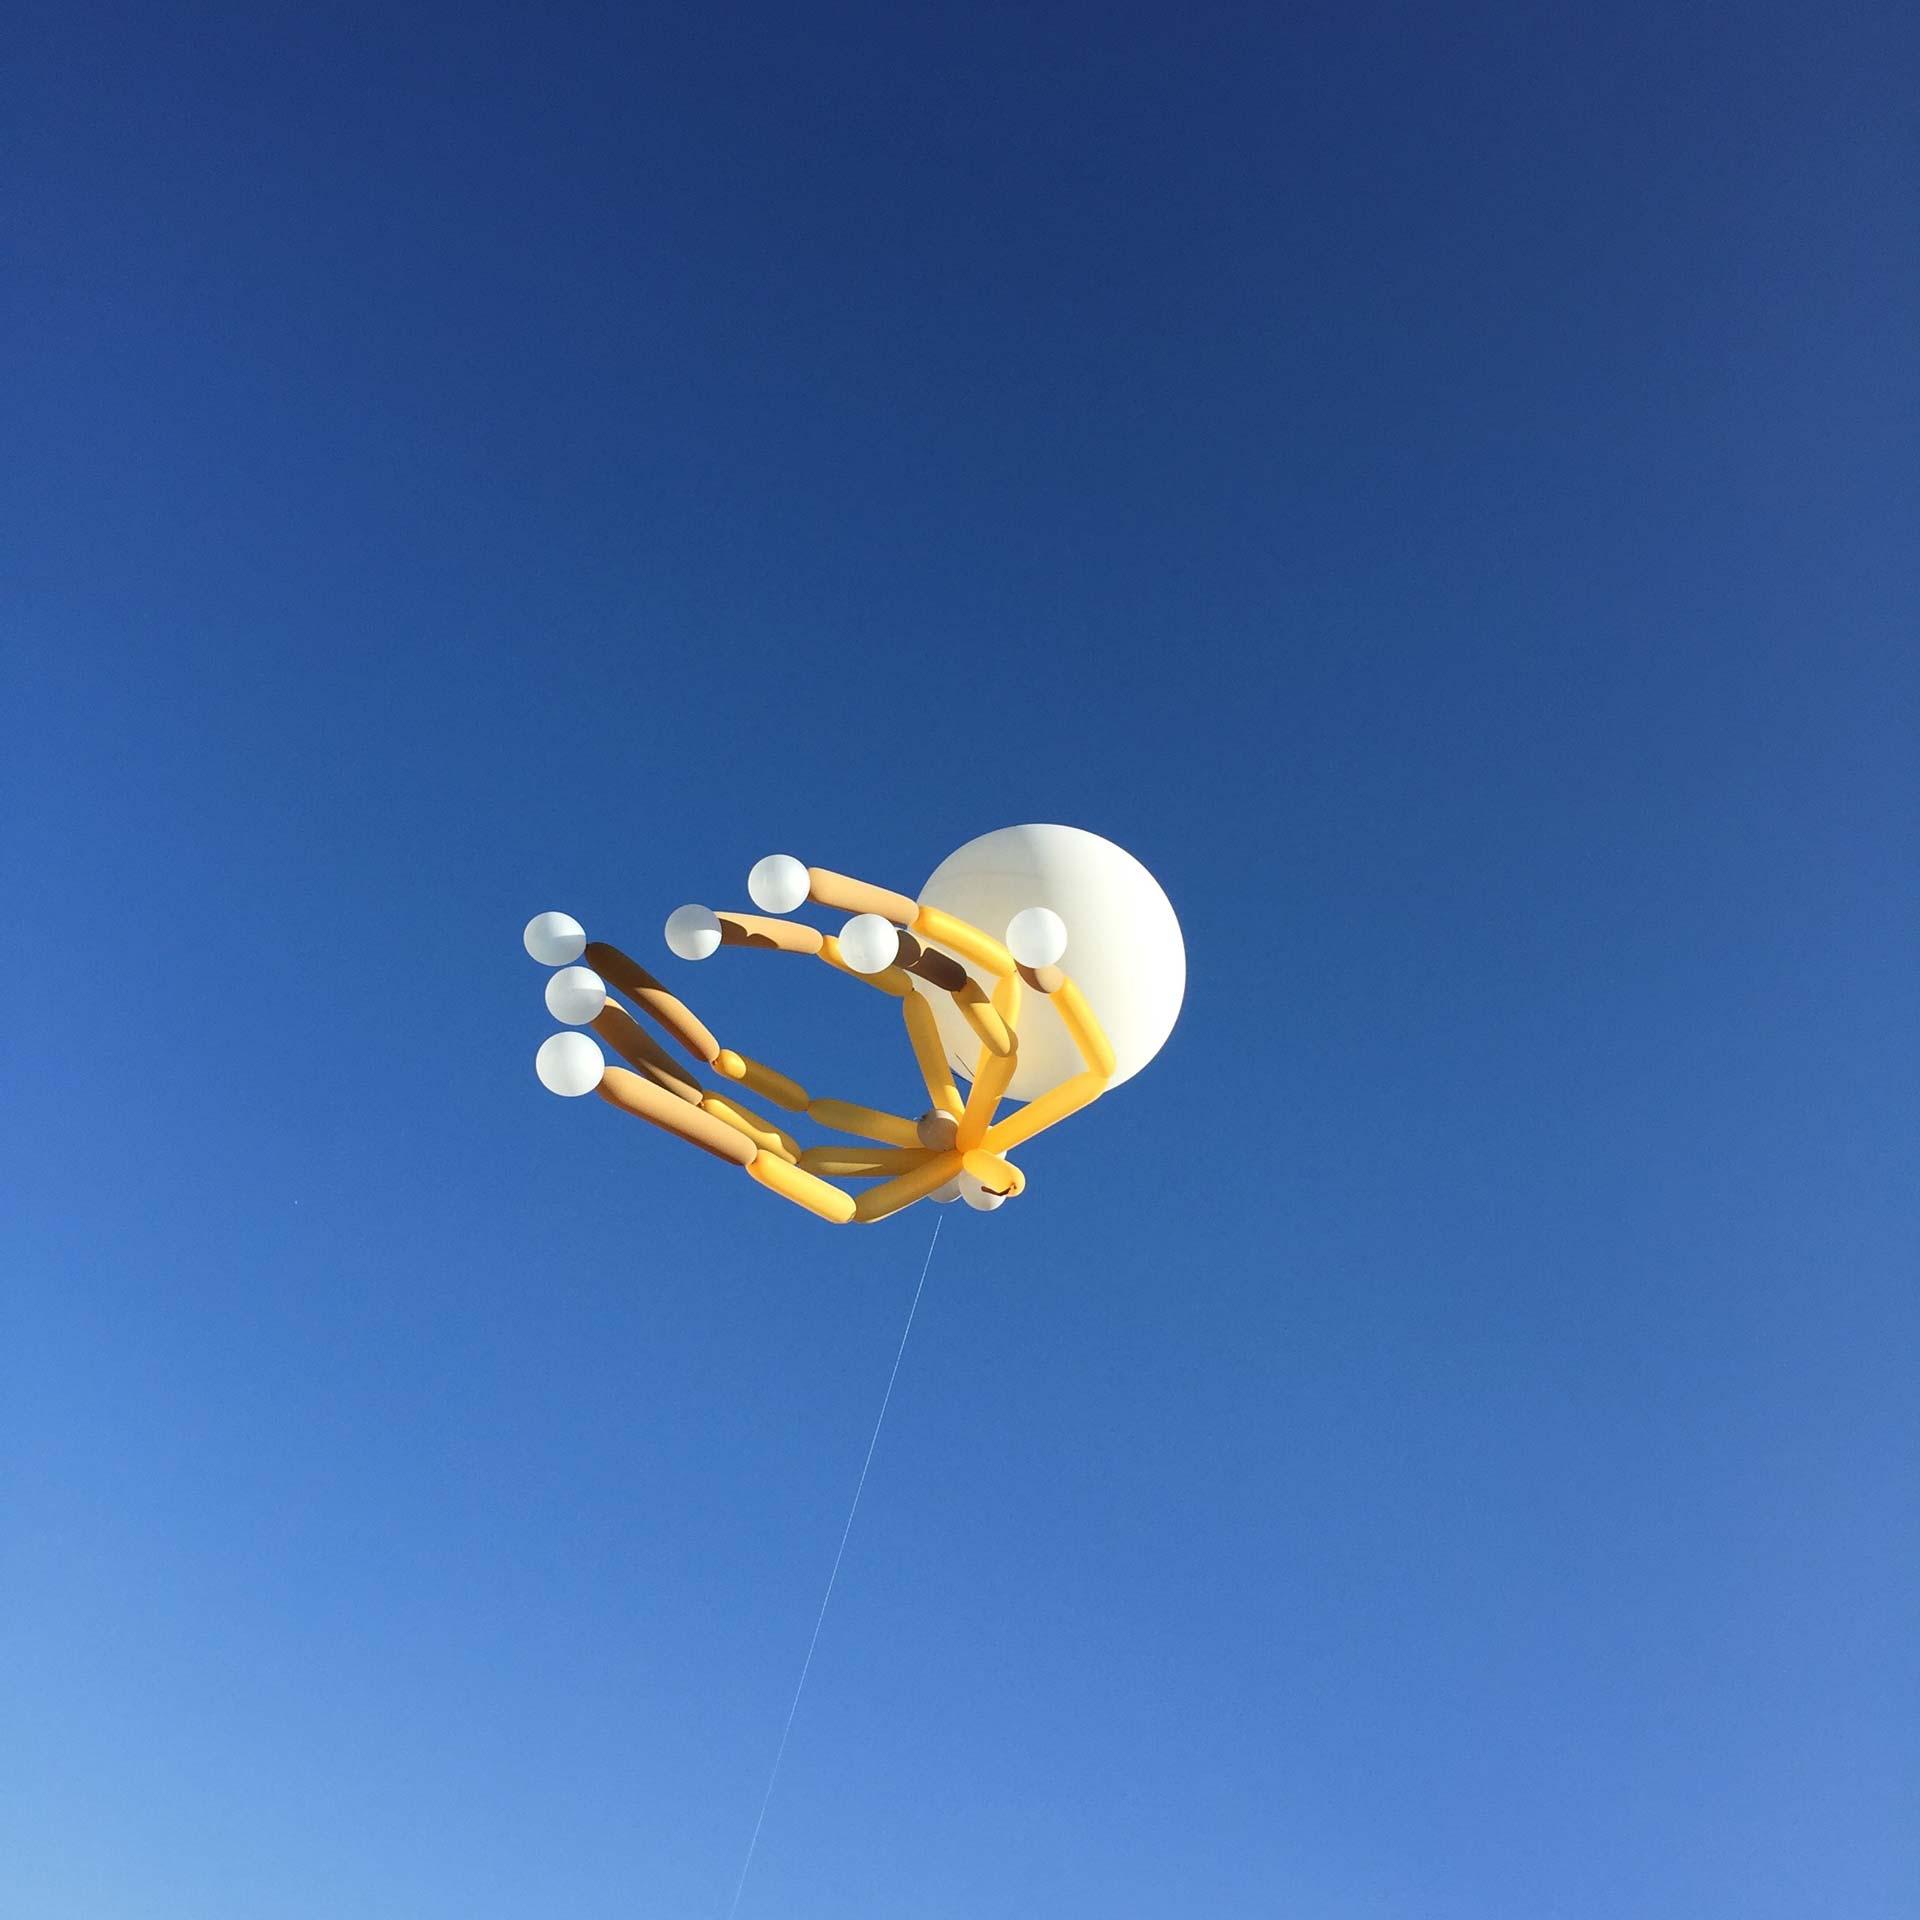 Luftballons auf dem Lunatic